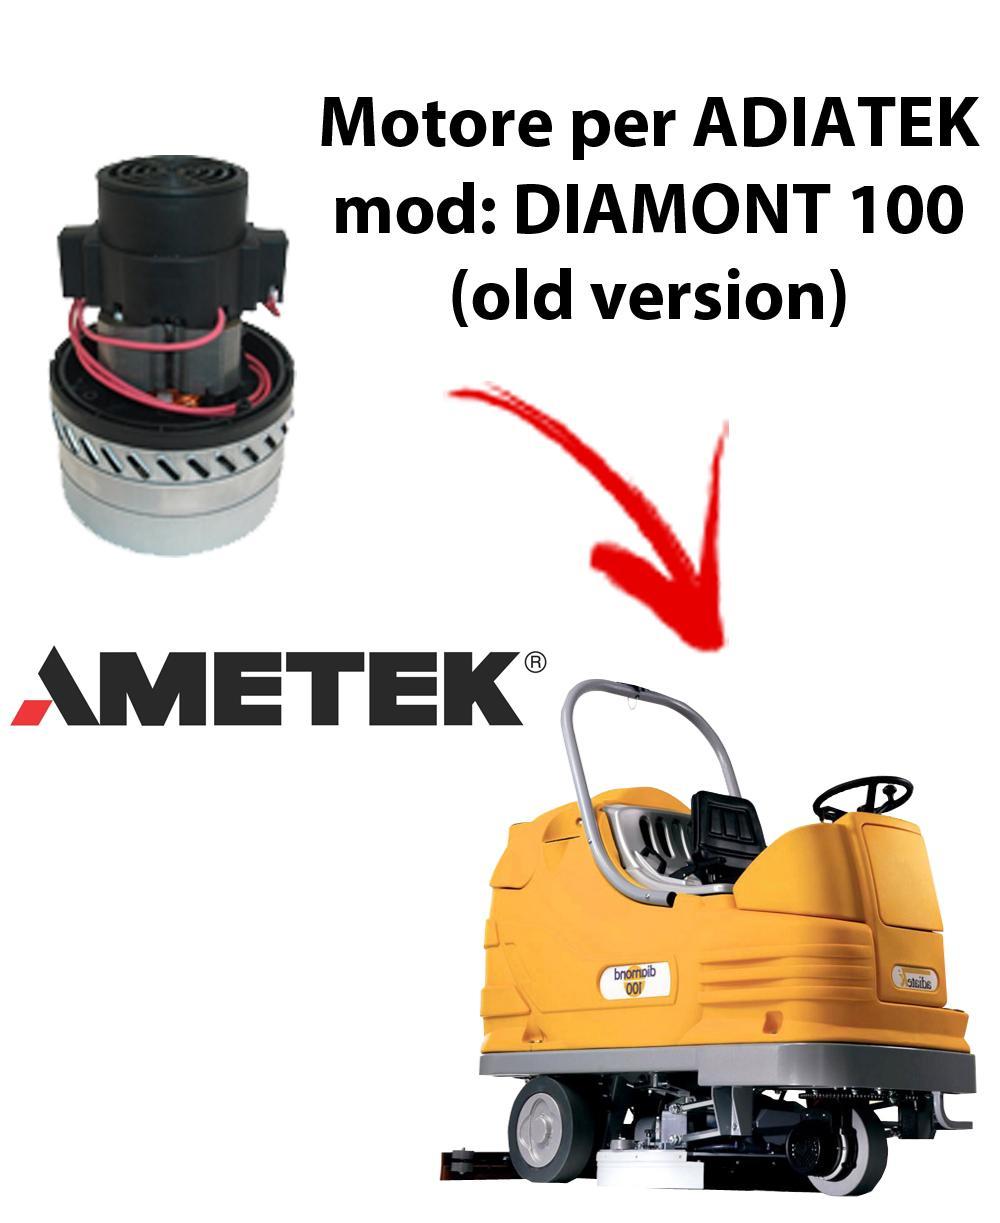 Diamond 100  Motore AMETEK ITALIA aspirazione per lavapavimenti Adiatek